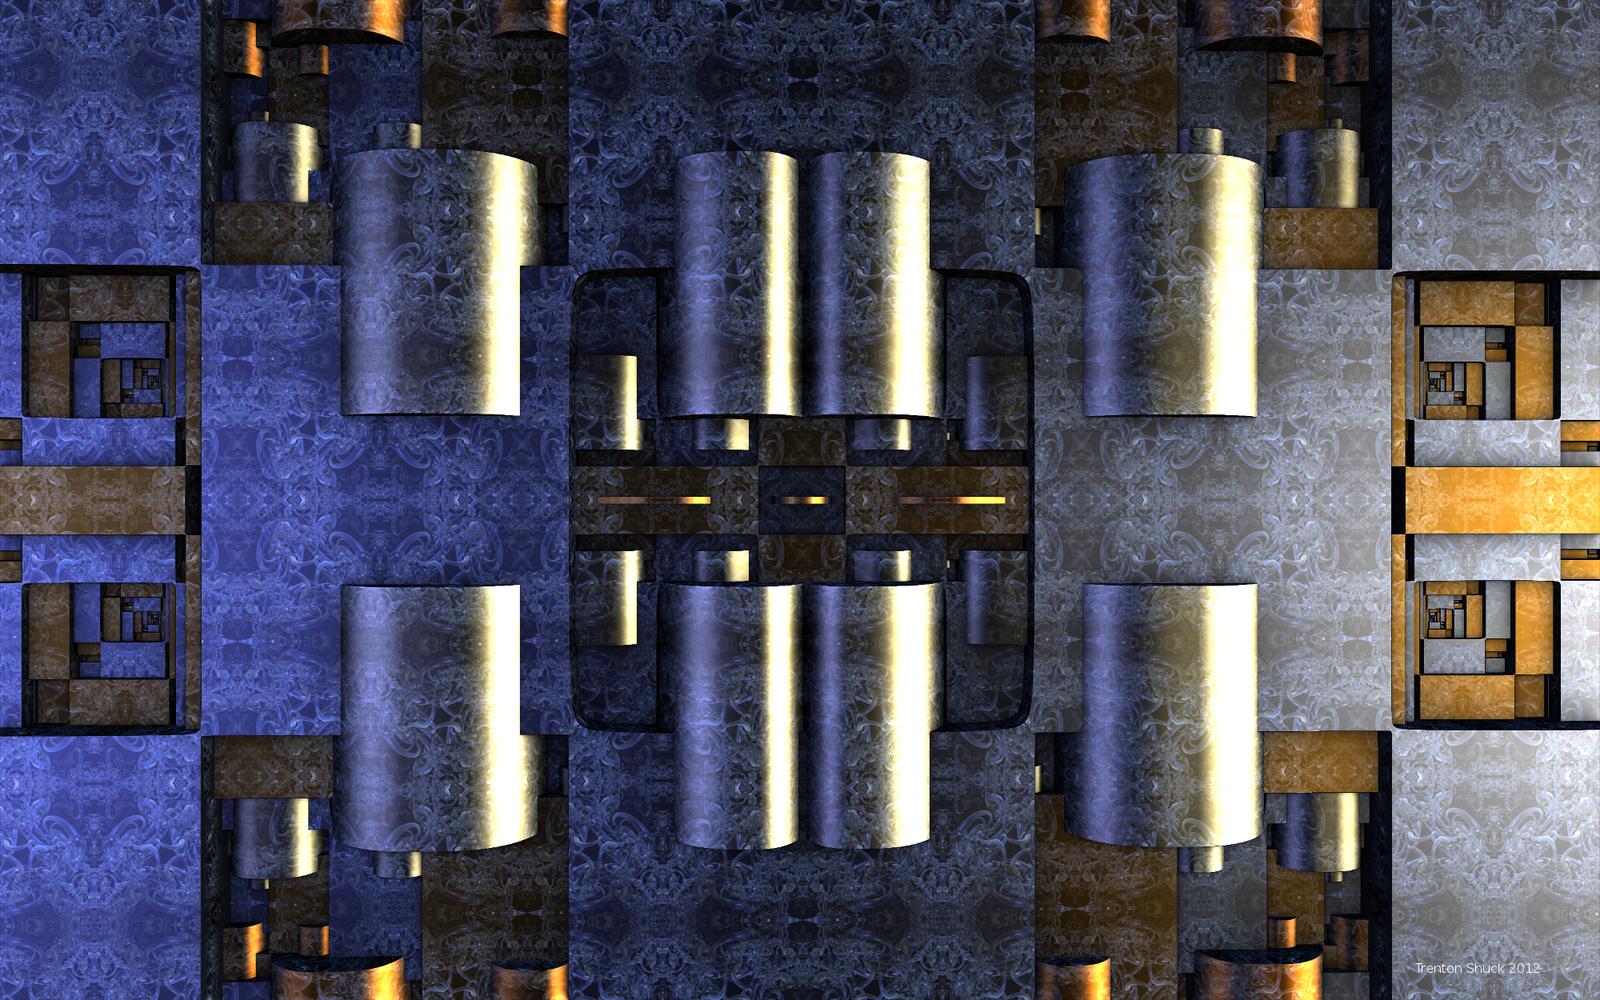 Infinity Box Var 2 by Trenton-Shuck